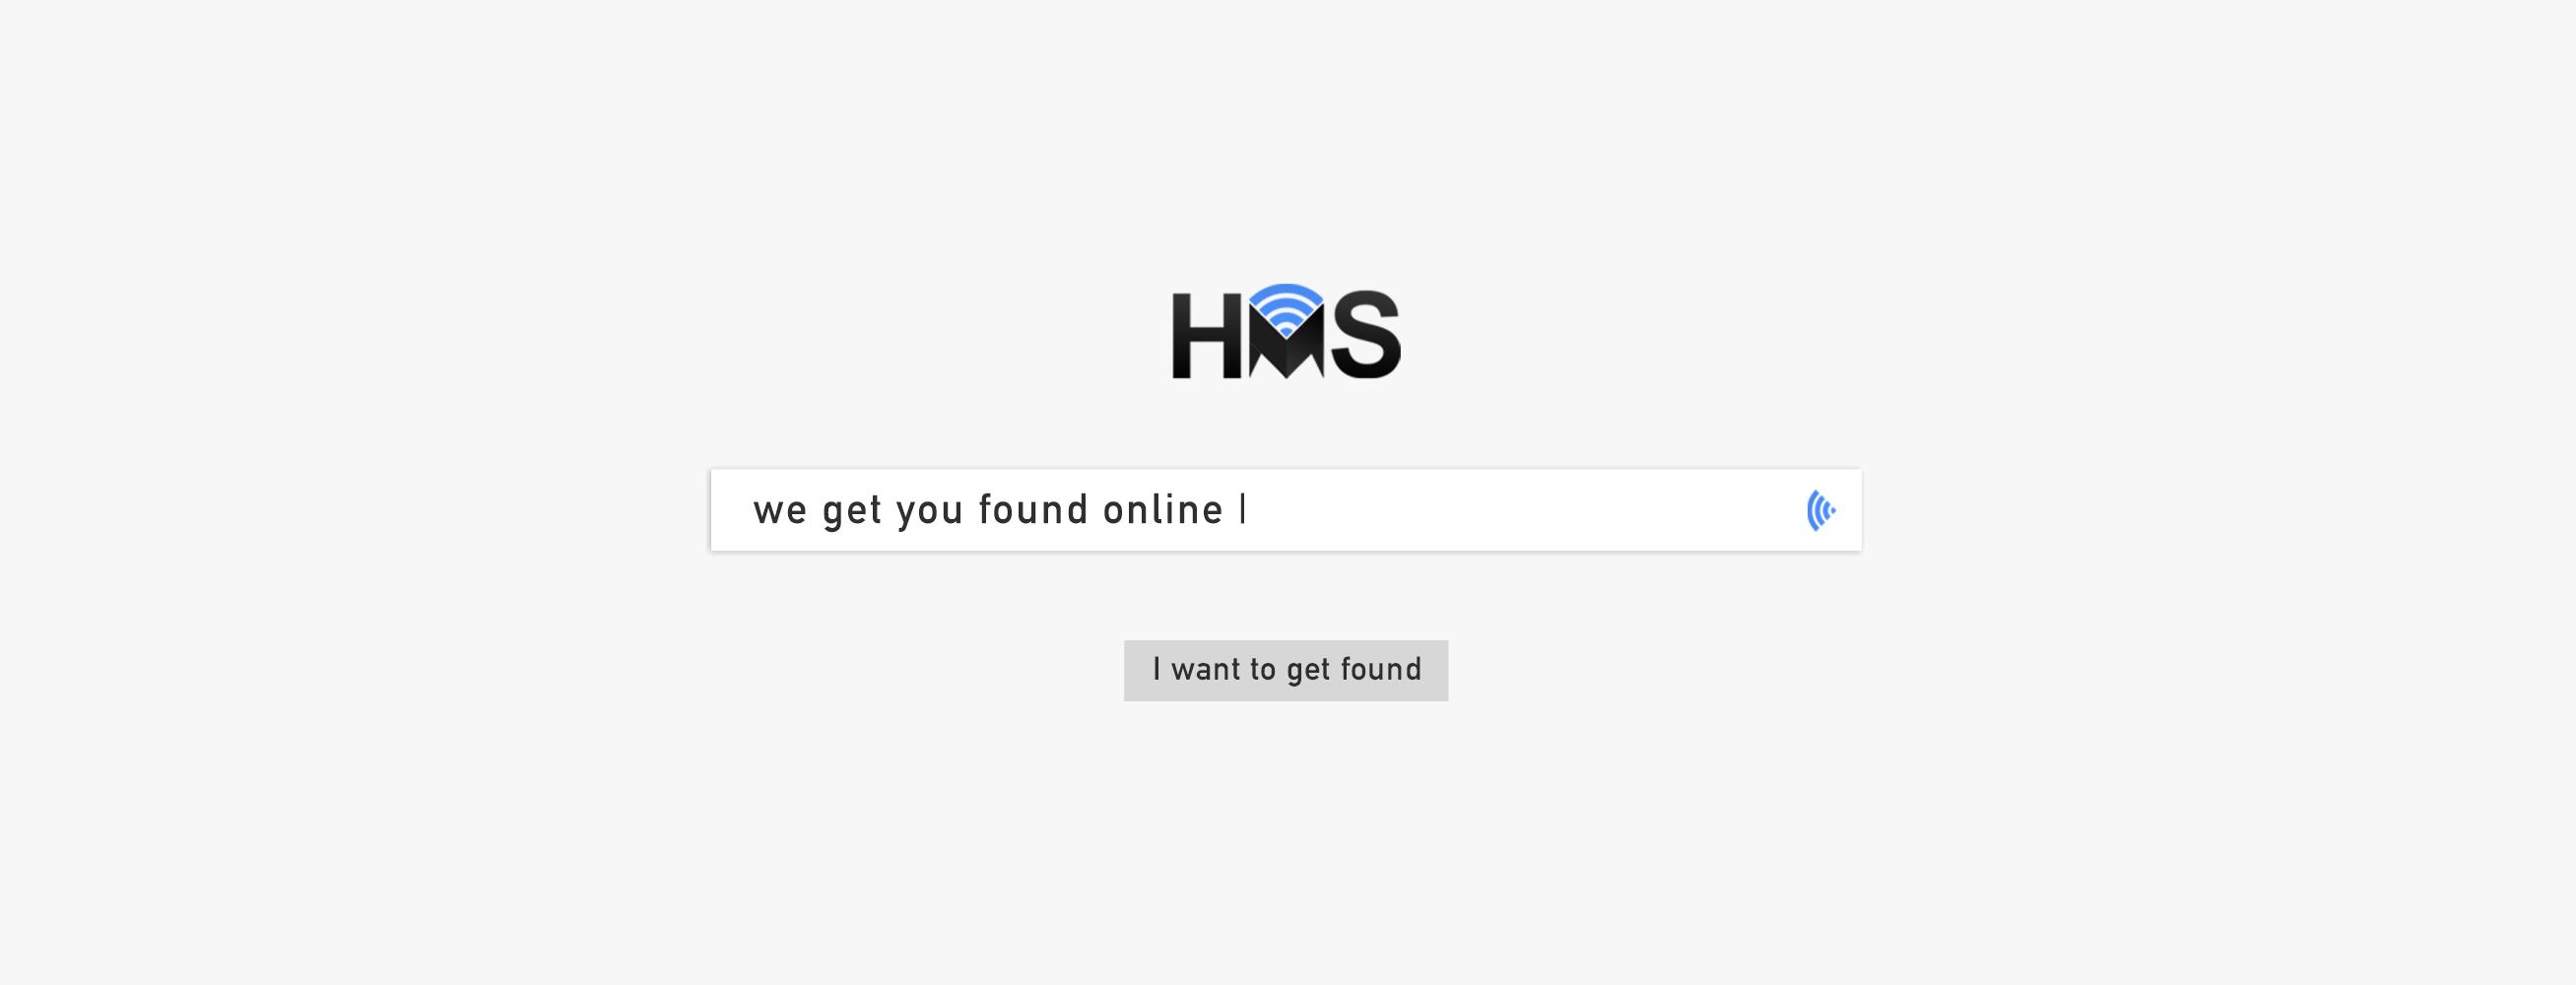 hms-communicatins